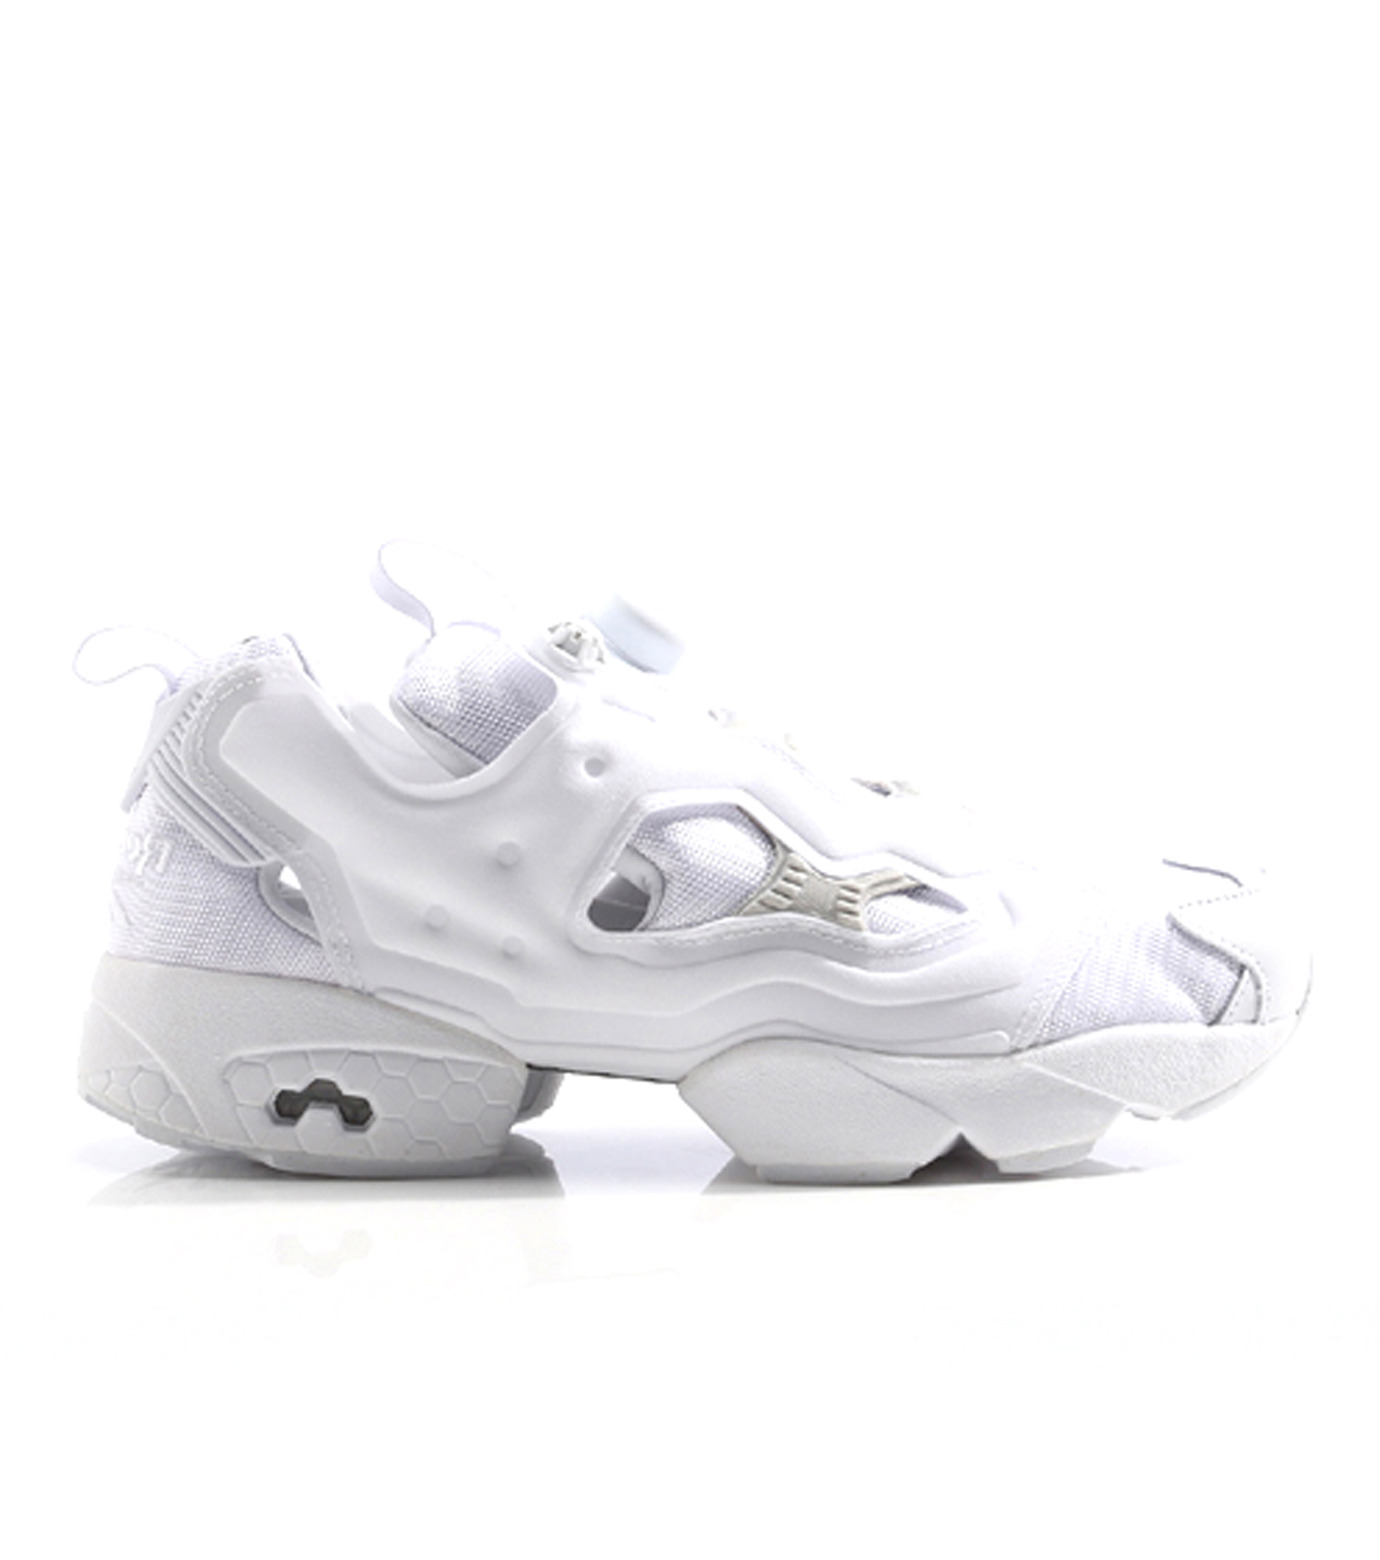 Reebok(リーボック)のINSTAPUMP FURY OG-WHITE(シューズ/shoes)-AR2199-4 拡大詳細画像1